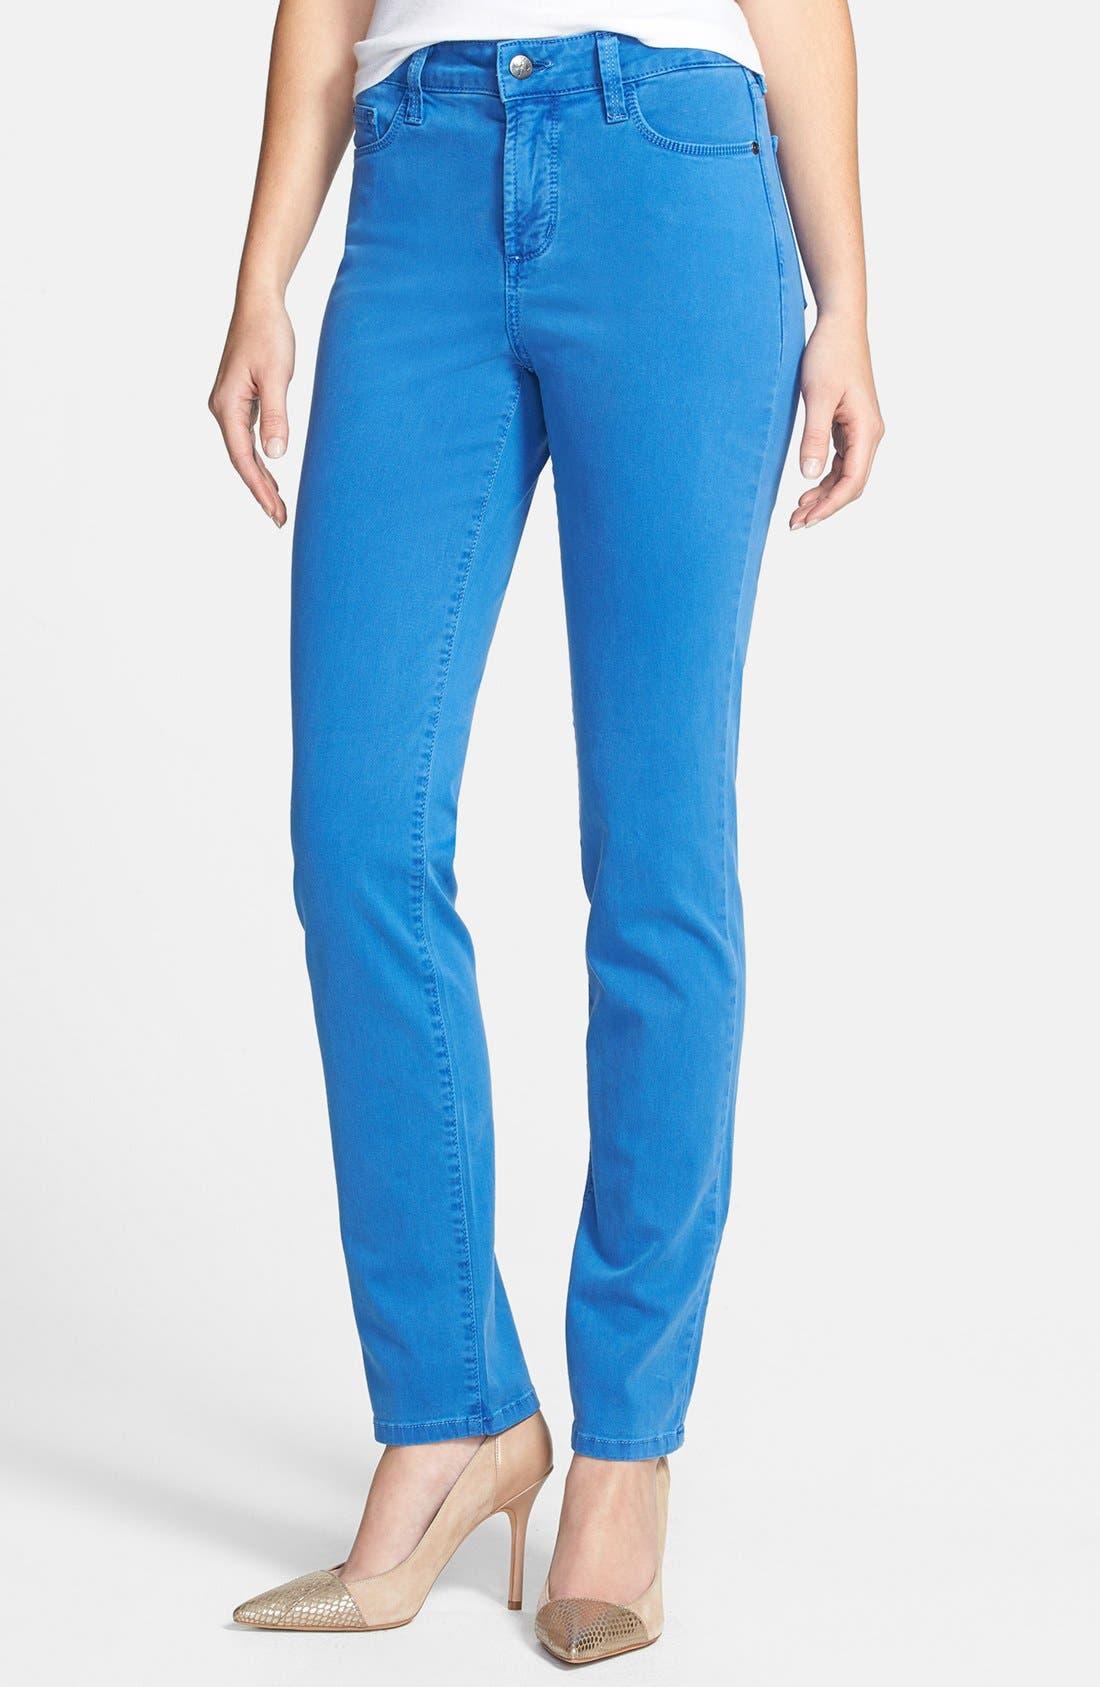 Main Image - NYDJ 'Sheri' Colored Stretch Denim Skinny Jeans